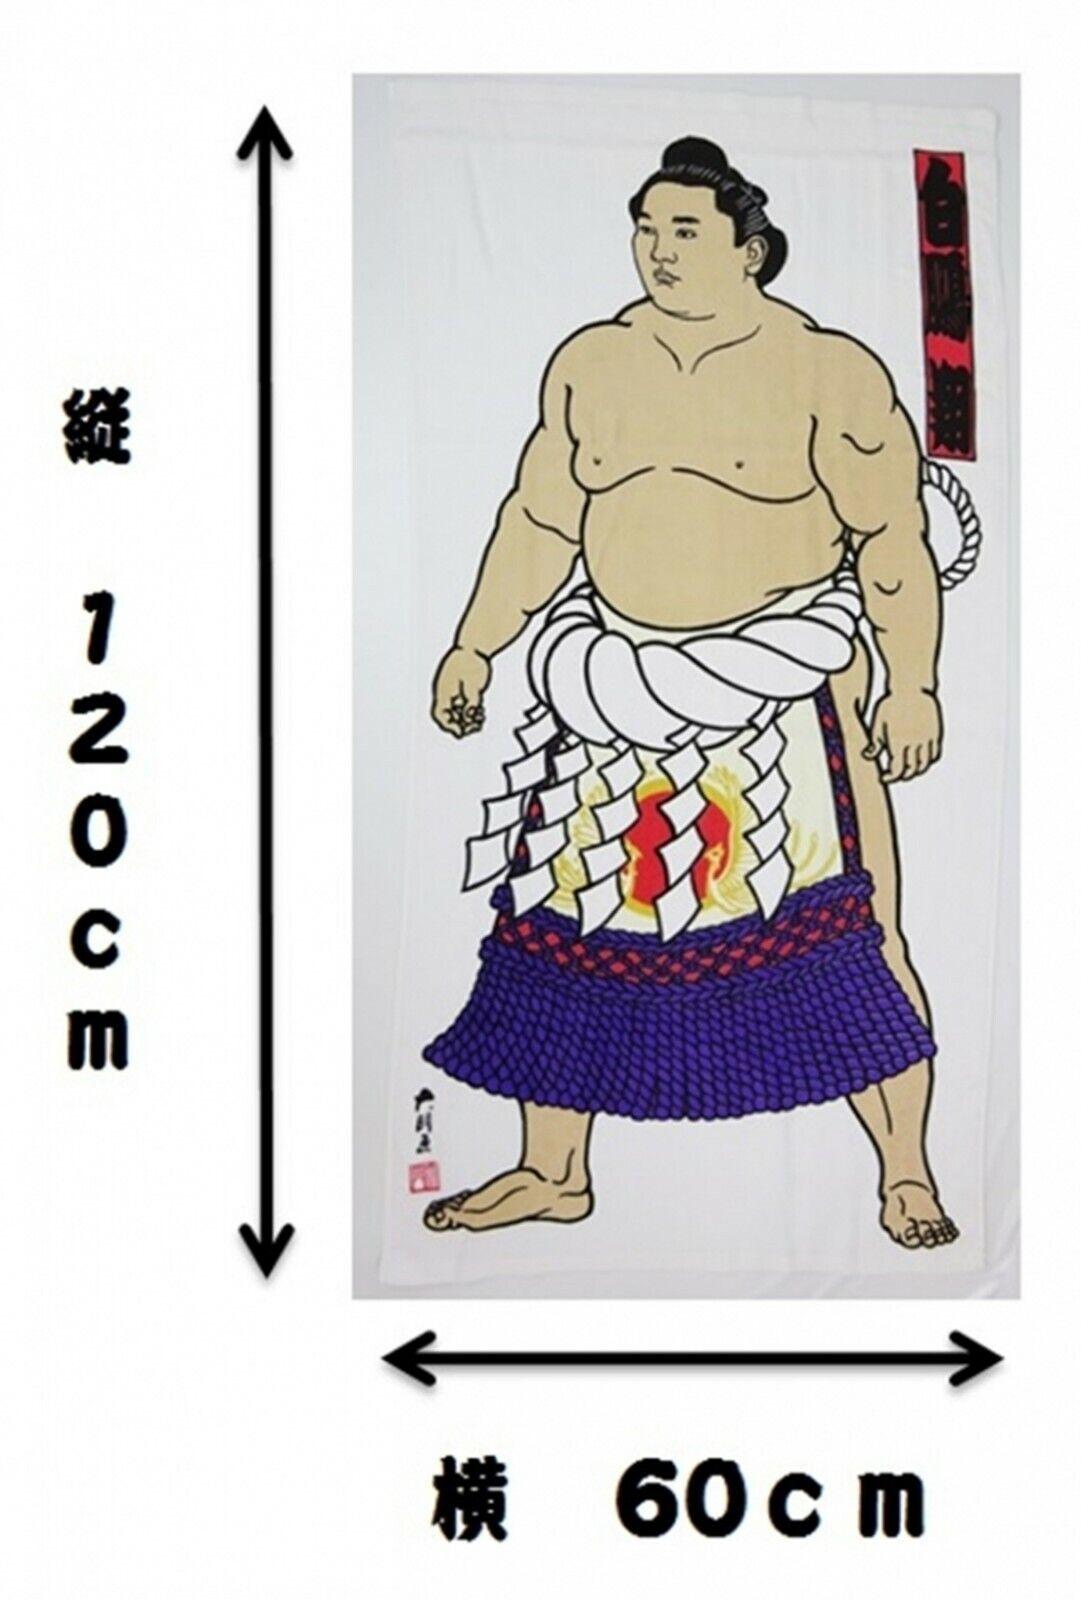 Hakuho Sumo Bath Towel Japanese Wrestler Yokozuna Champion Rikishi Ryogoku F S